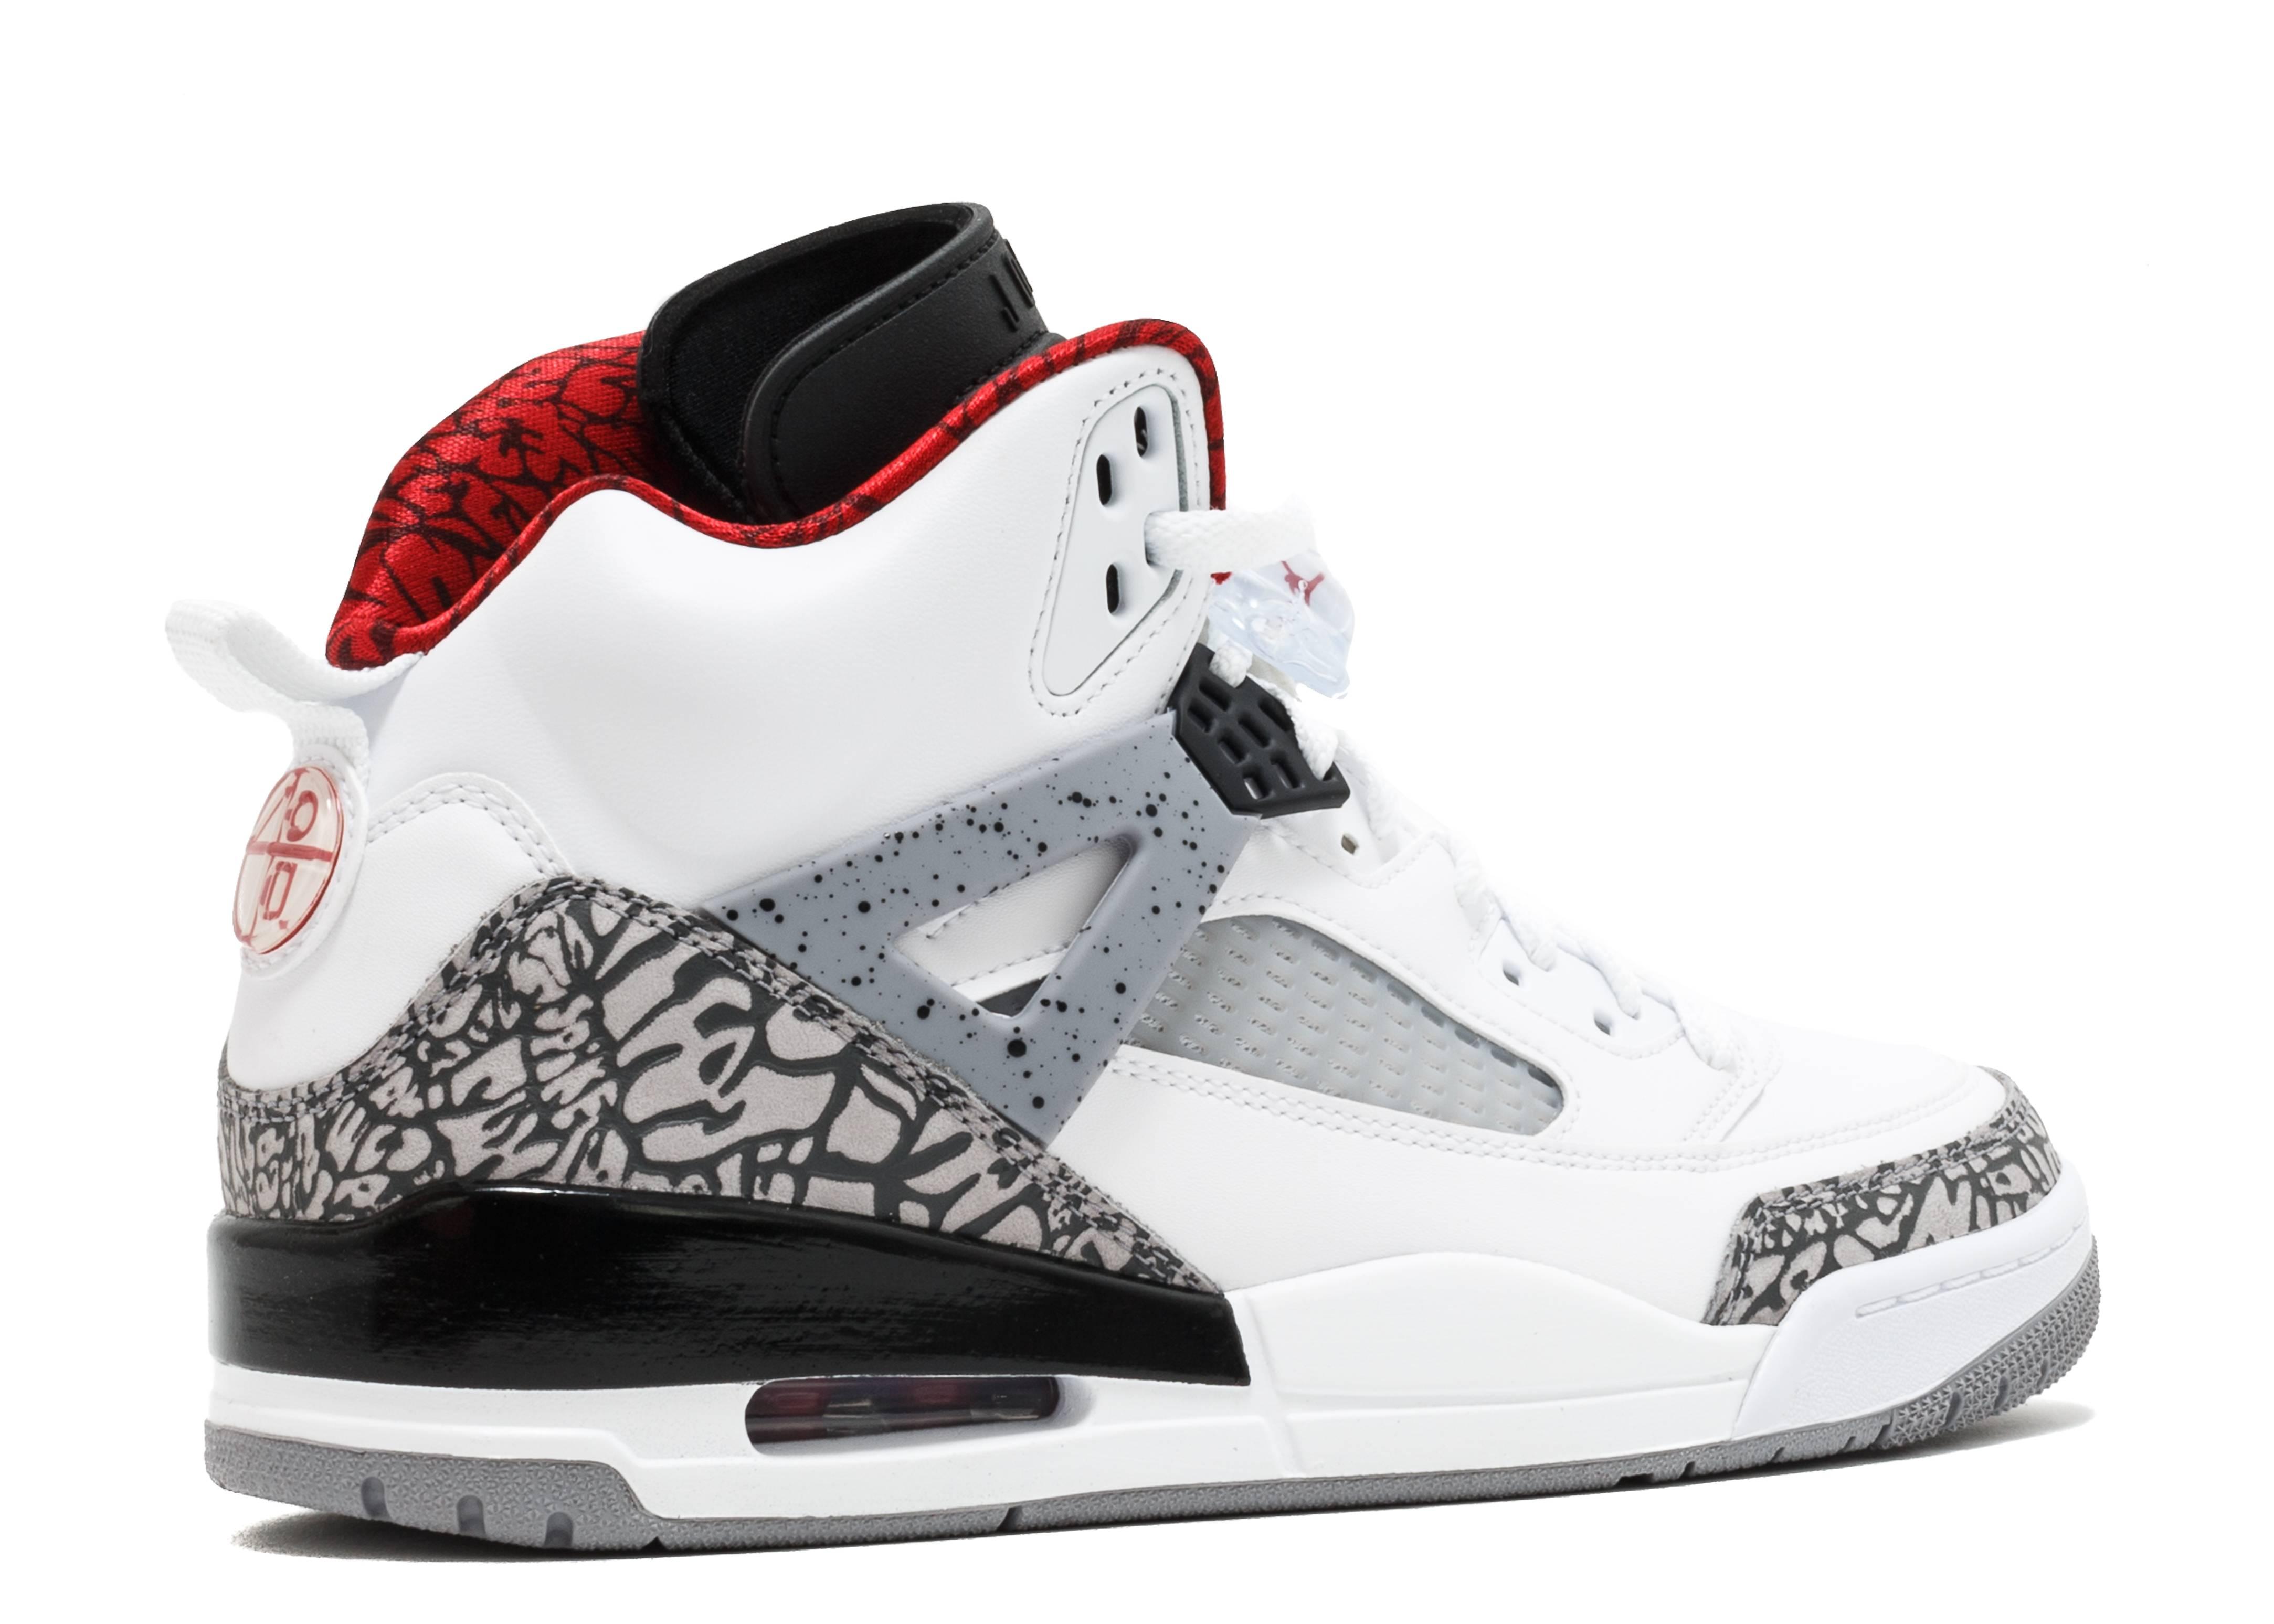 c2fe1b7c4ba Spizike - Air Jordan - 315371 122 - white varsity red - cement grey ...